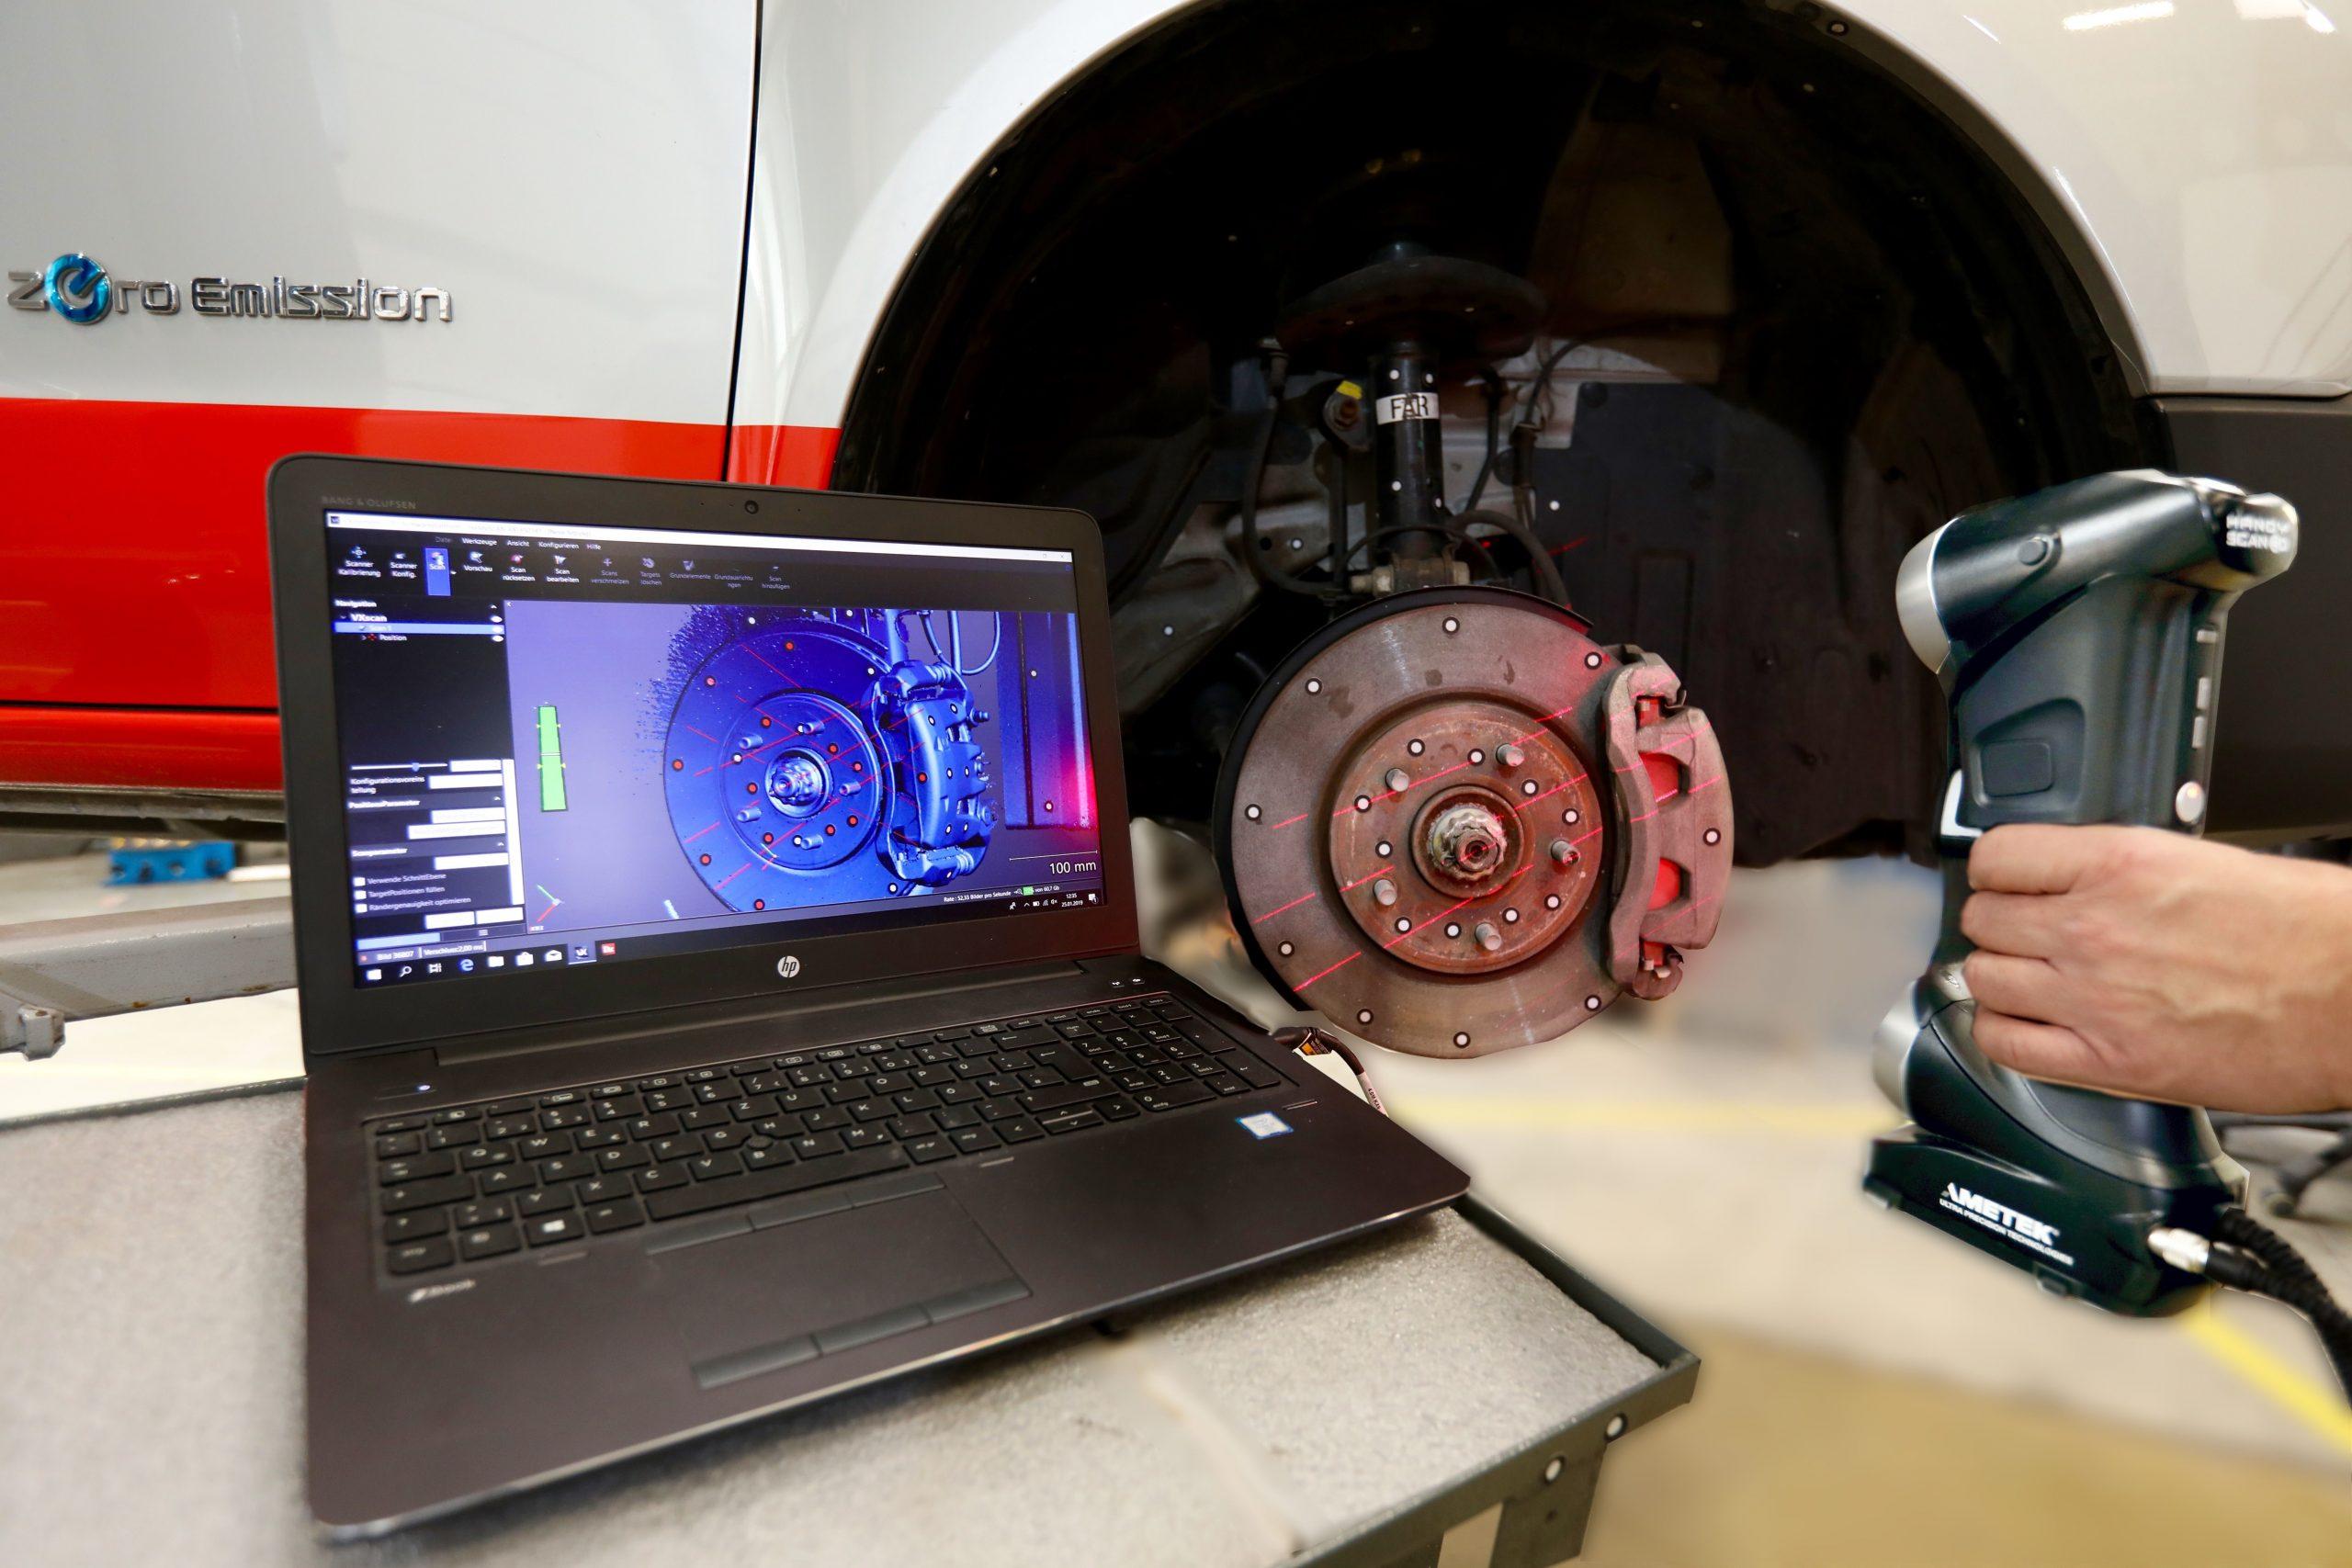 3D scanning live on computer